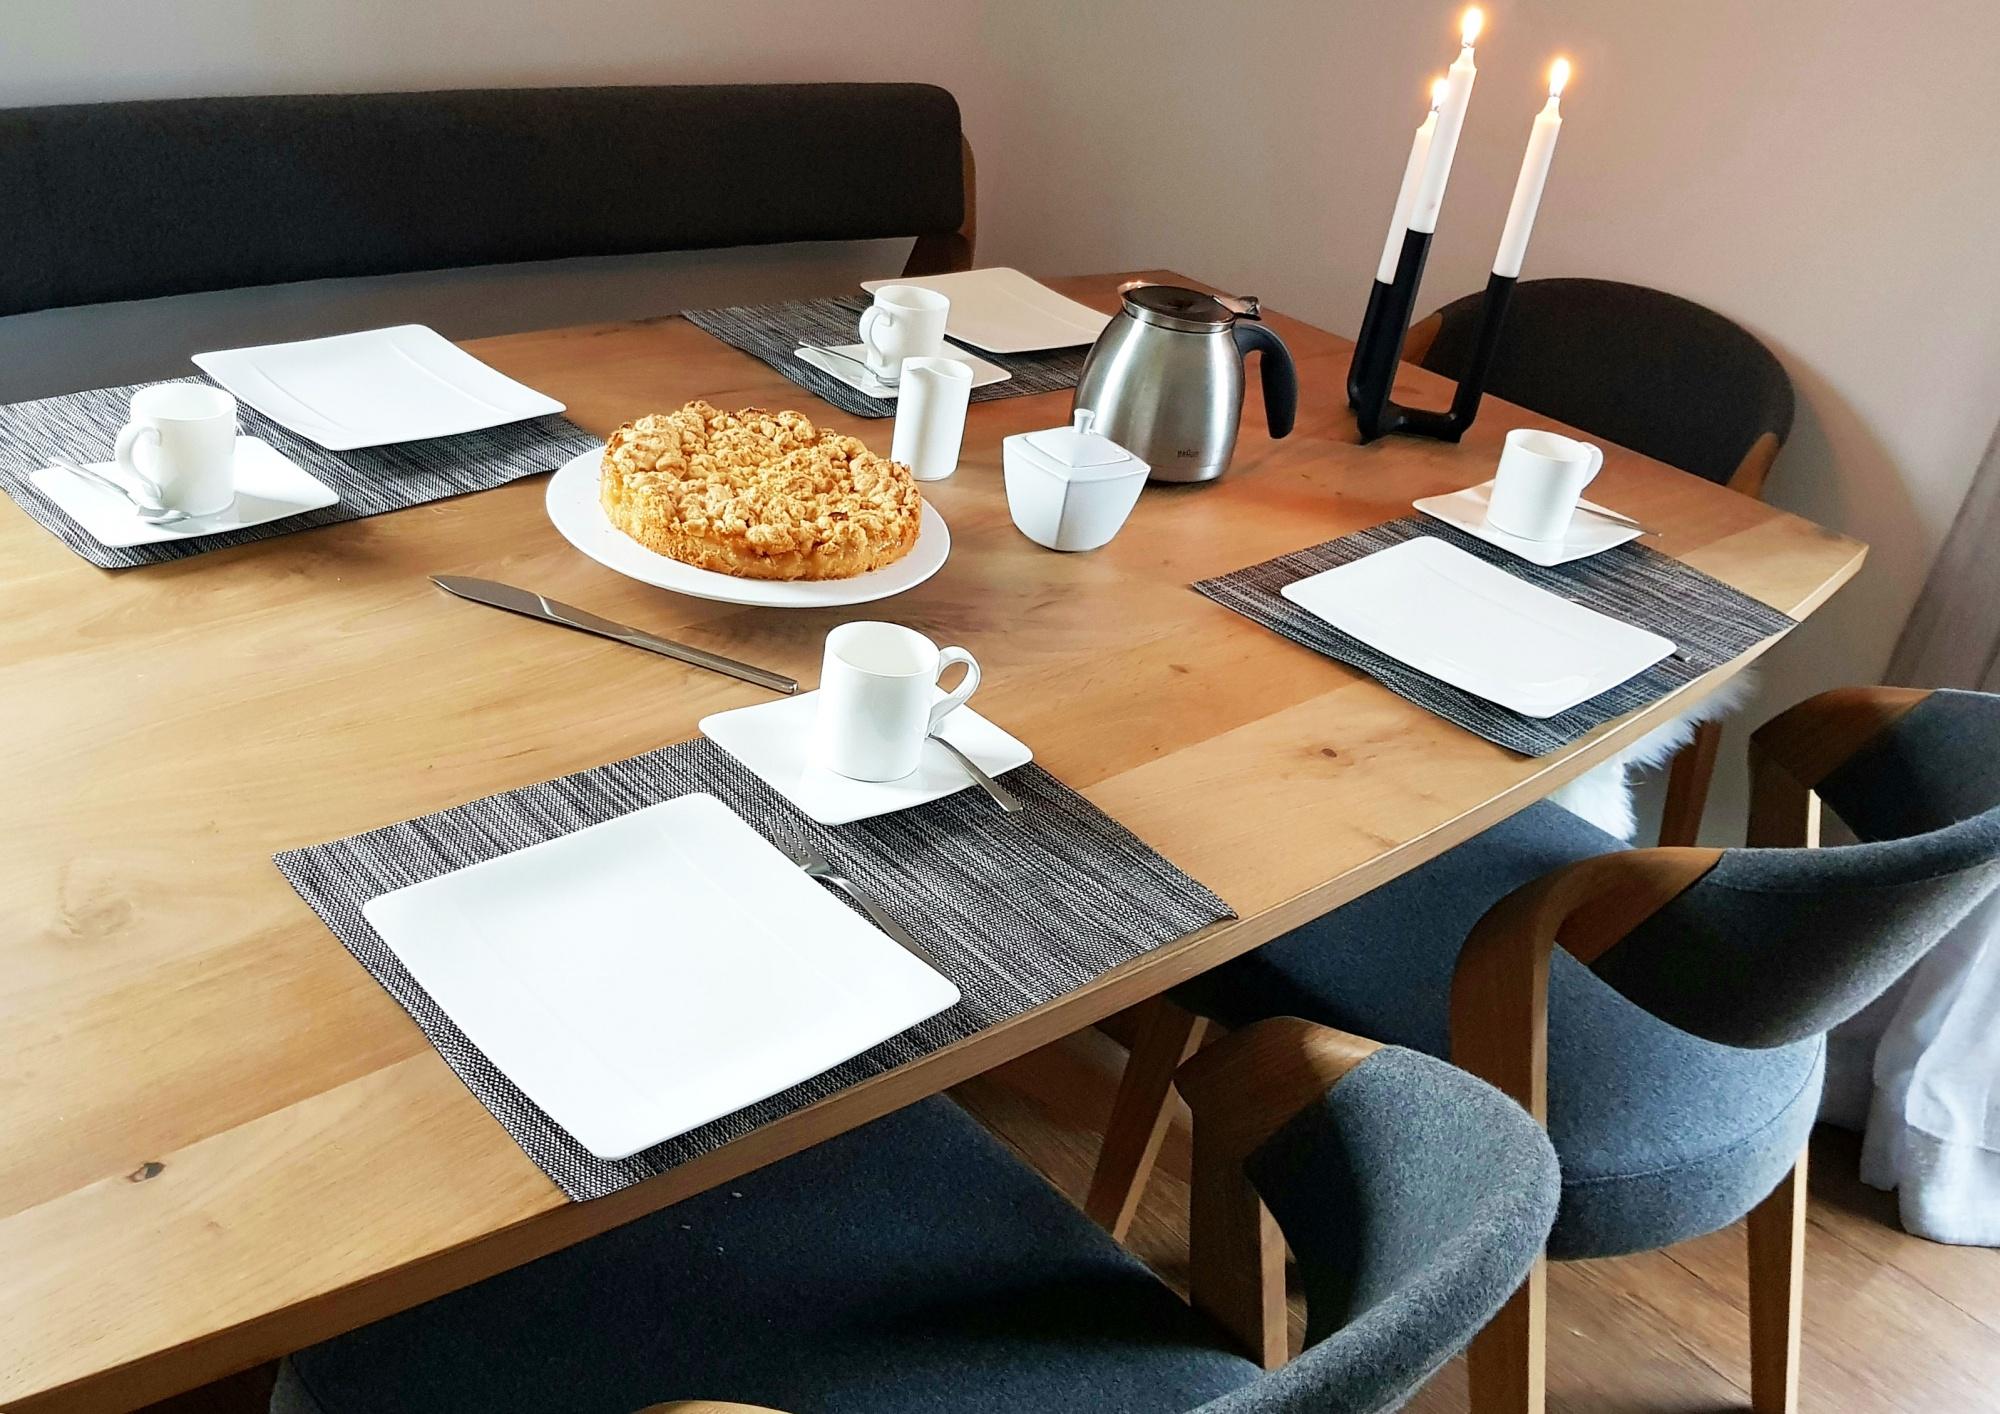 Tischset meliert (4er-Set), ca. 30x45 cm, versch. Farben